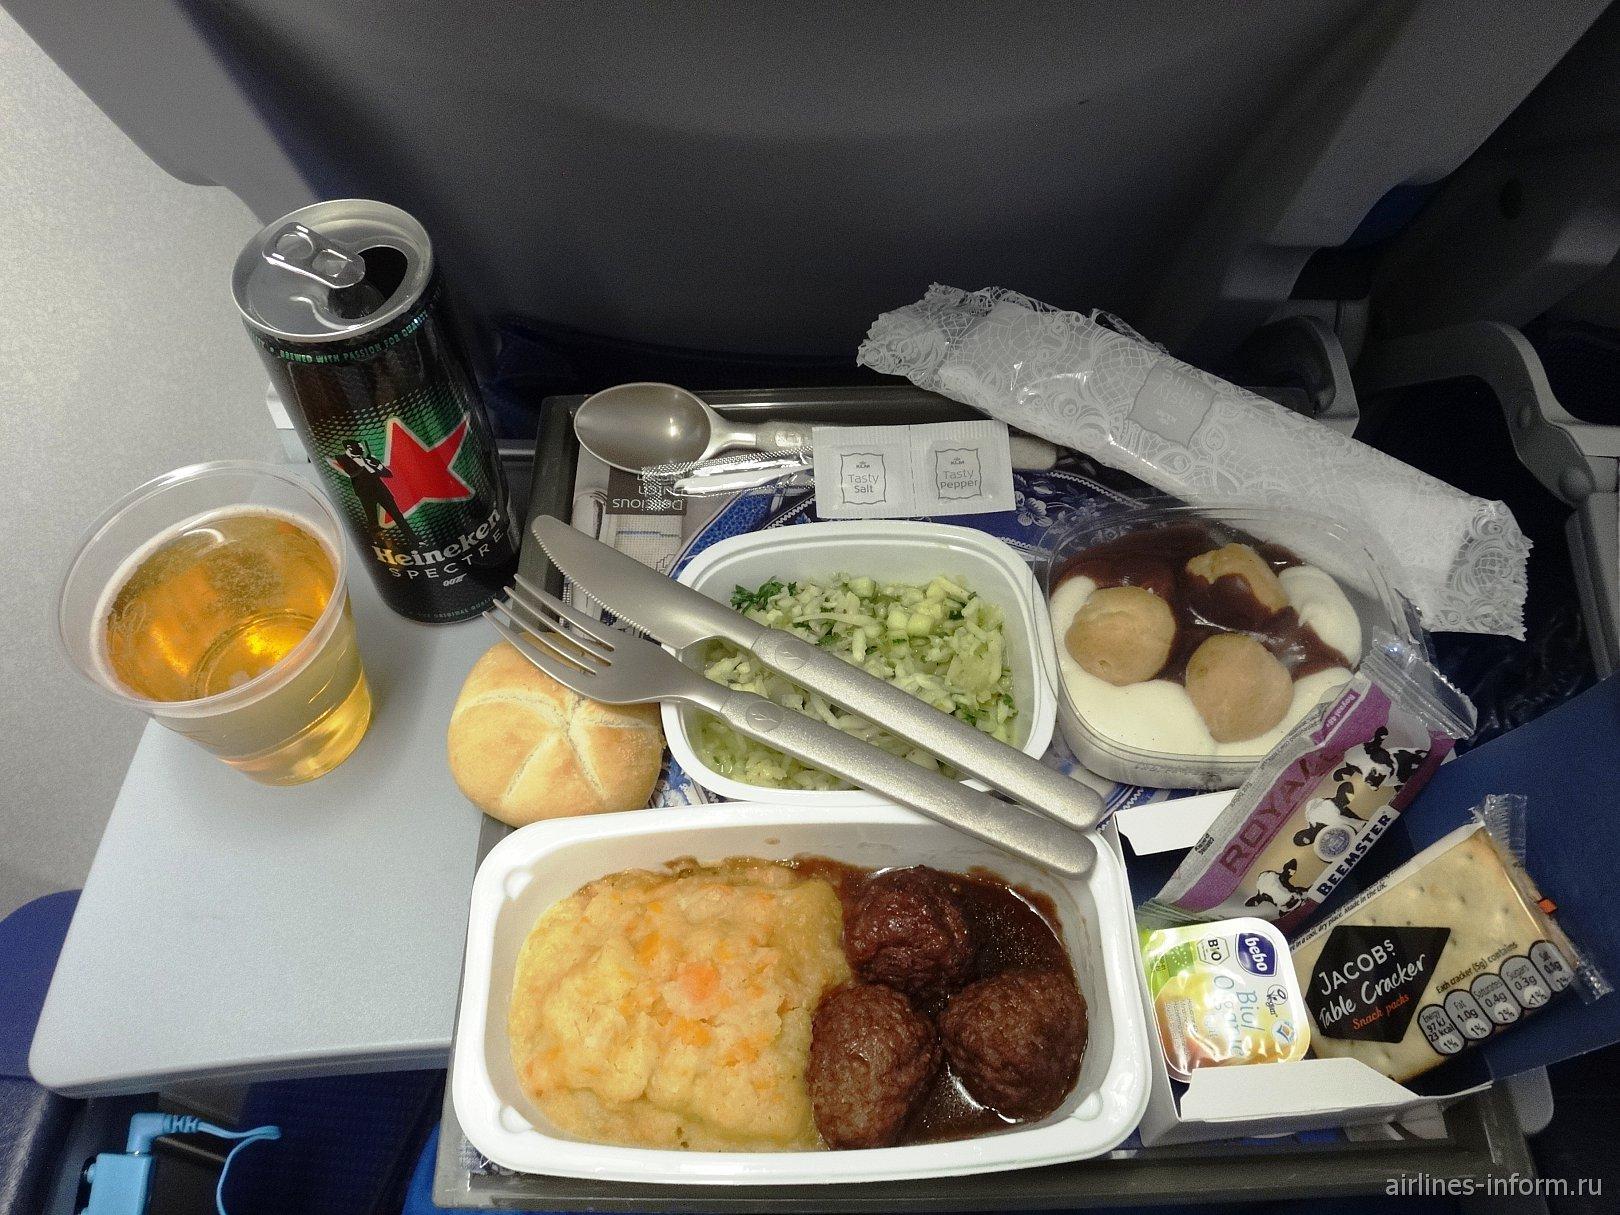 Бортпитание на рейсе Амстердам-Хьюстон авиакомпании KLM